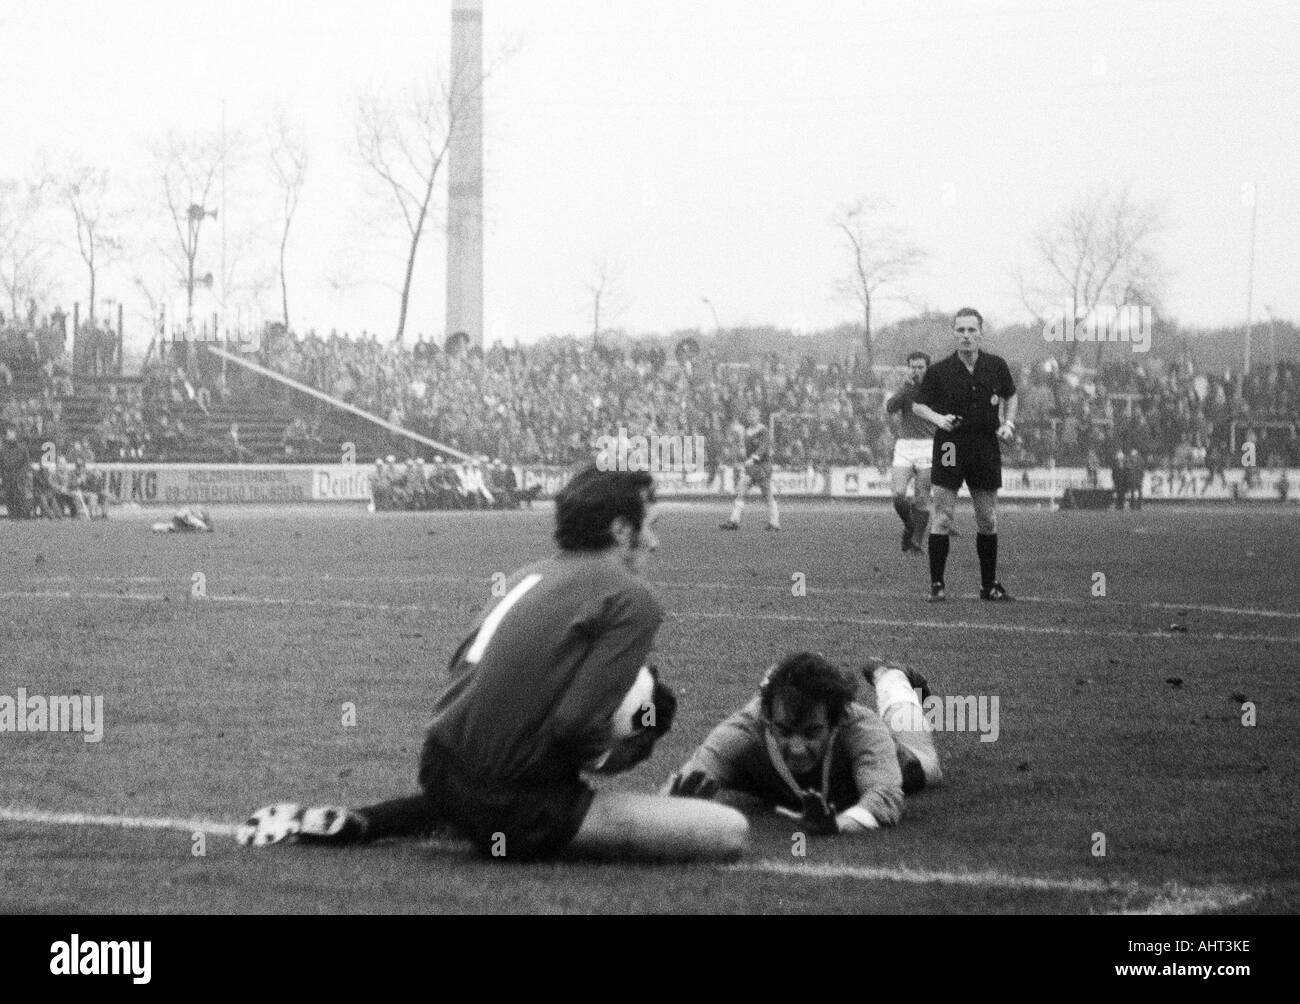 football, Bundesliga, 1970/1971, Niederrhein Stadium, Rot-Weiss Oberhausen versus Kickers Offenbach 2:2, scene of the match, f.l.t.r. keeper Karlheinz Volz (OFC), Franz Krauthausen (RWO), referee Guenter Linn from Altendiez - Stock Image